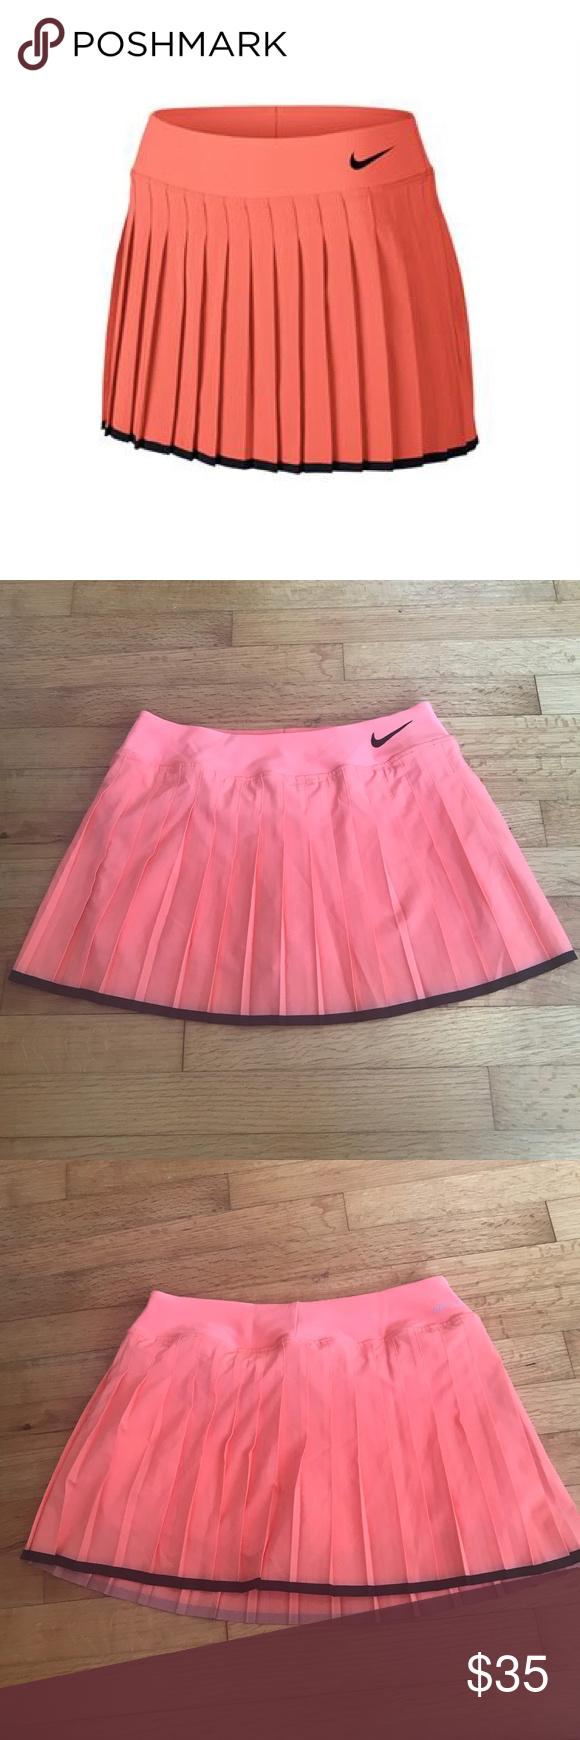 Nwt Nike Victory Tennis Skort Size M 728773 680 Tennis Skort Skort Clothes Design